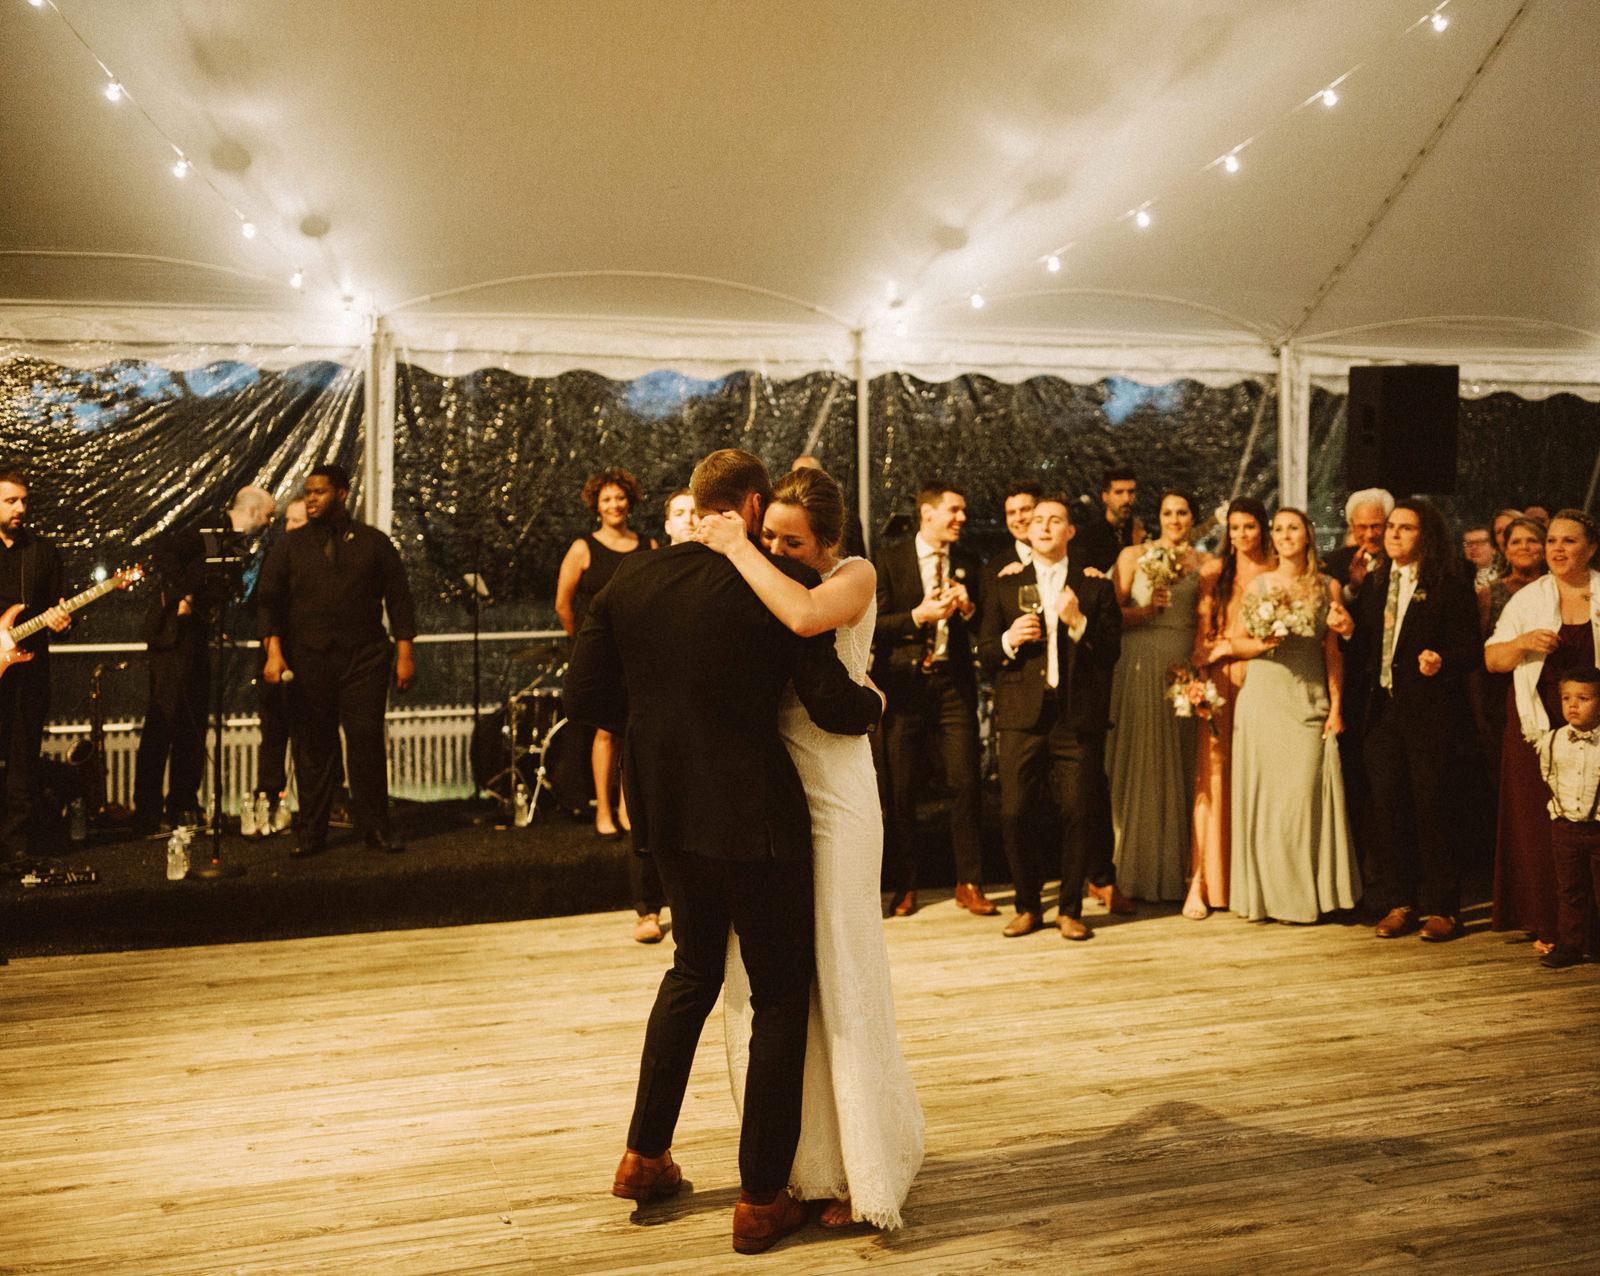 bridgeport-wedding-145 BRIDGEPORT, CONNECTICUT BACKYARD WEDDING